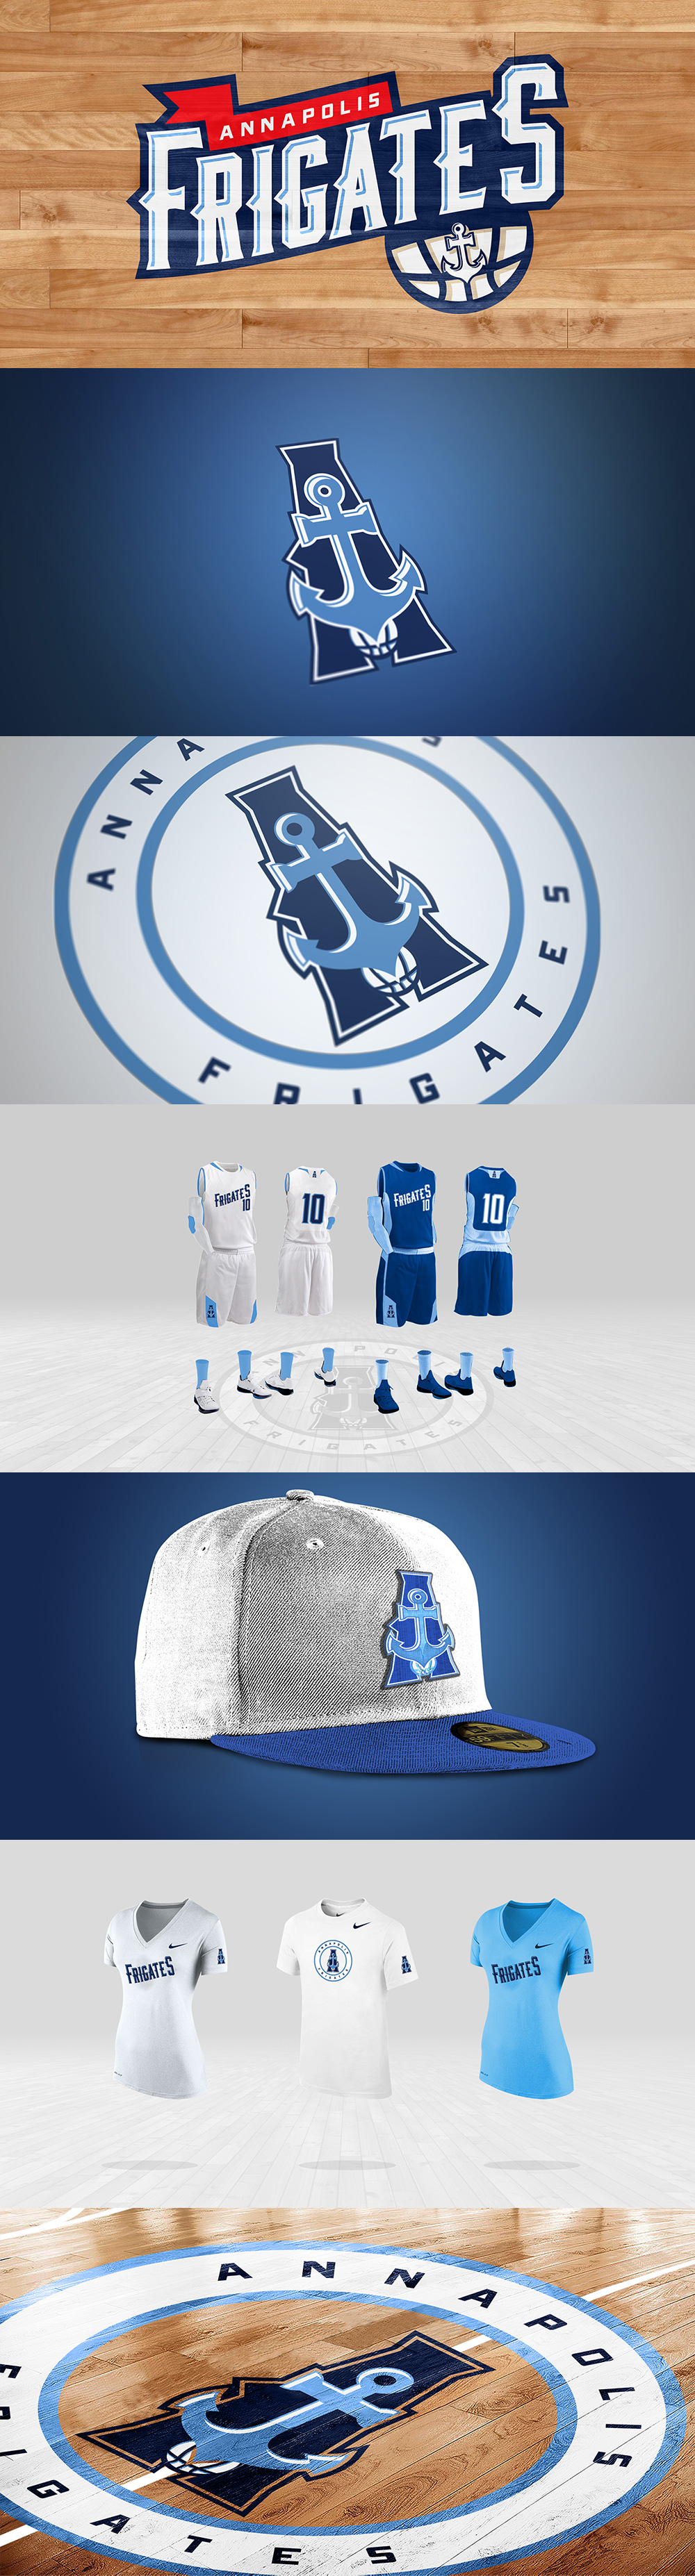 Basketball Team Logo: Annapolis Frigates by Kevin Aka